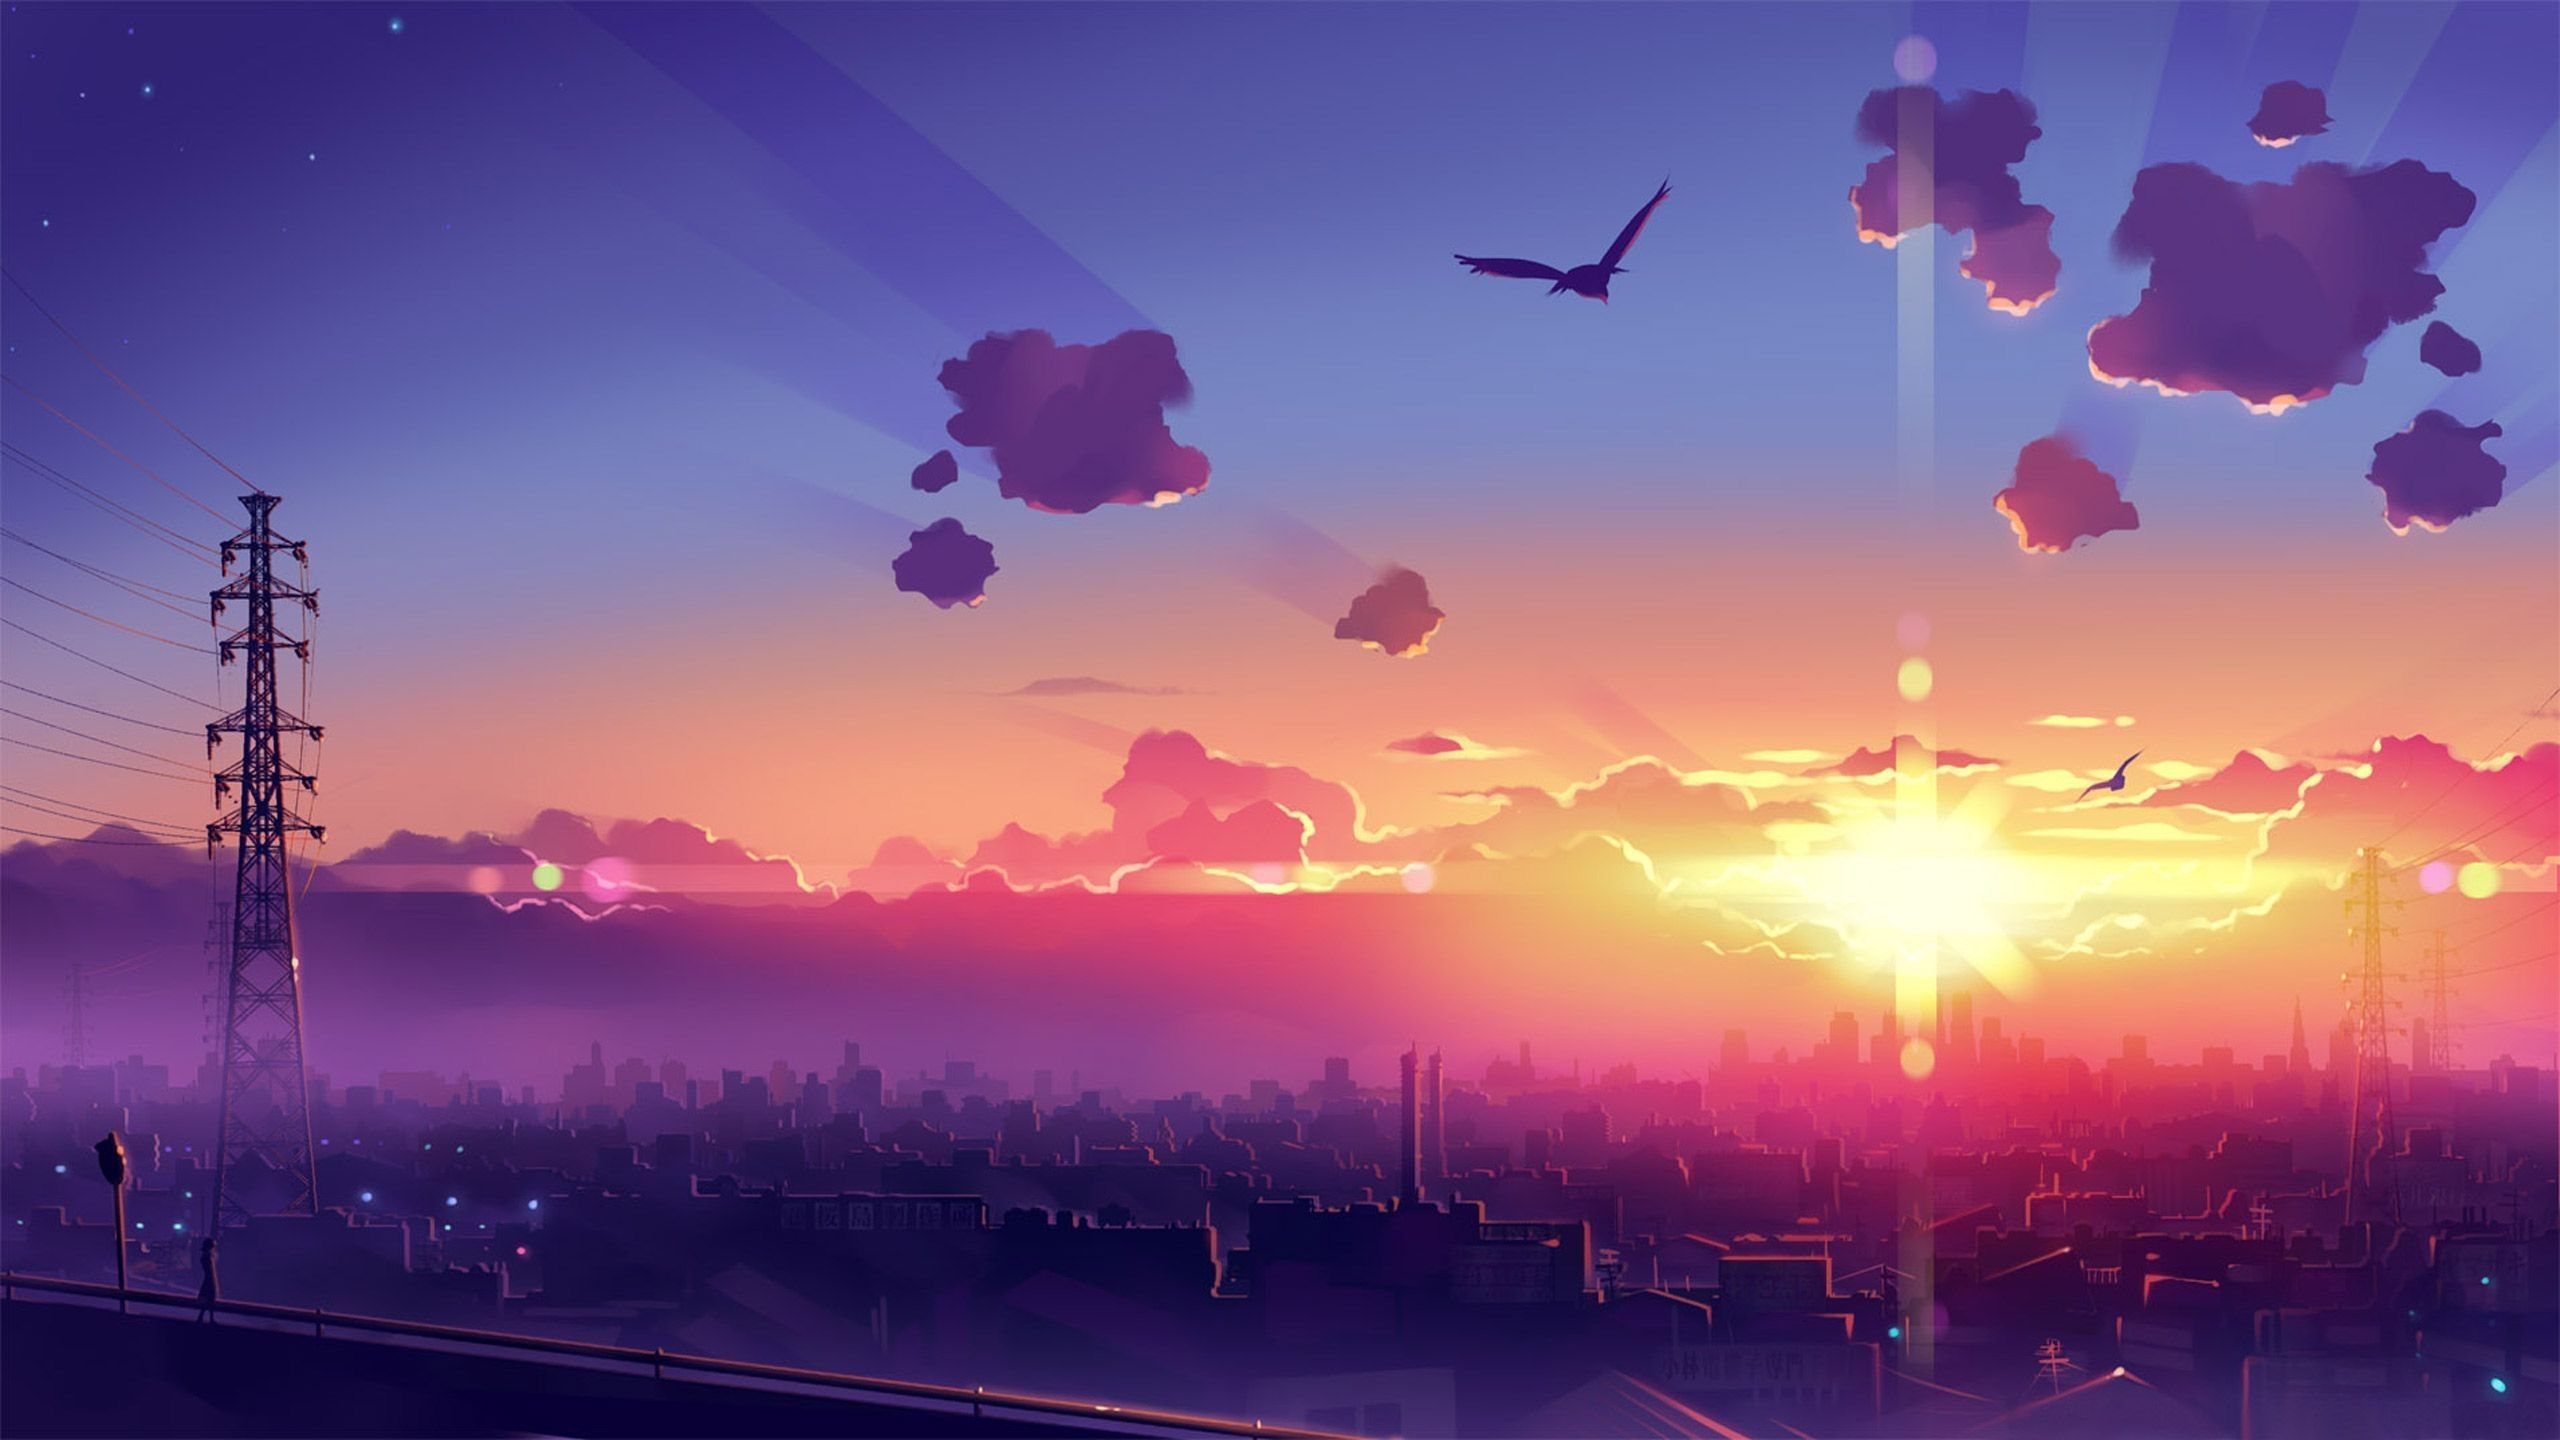 Unique Desktop Wallpaper Panorama Anime scenery